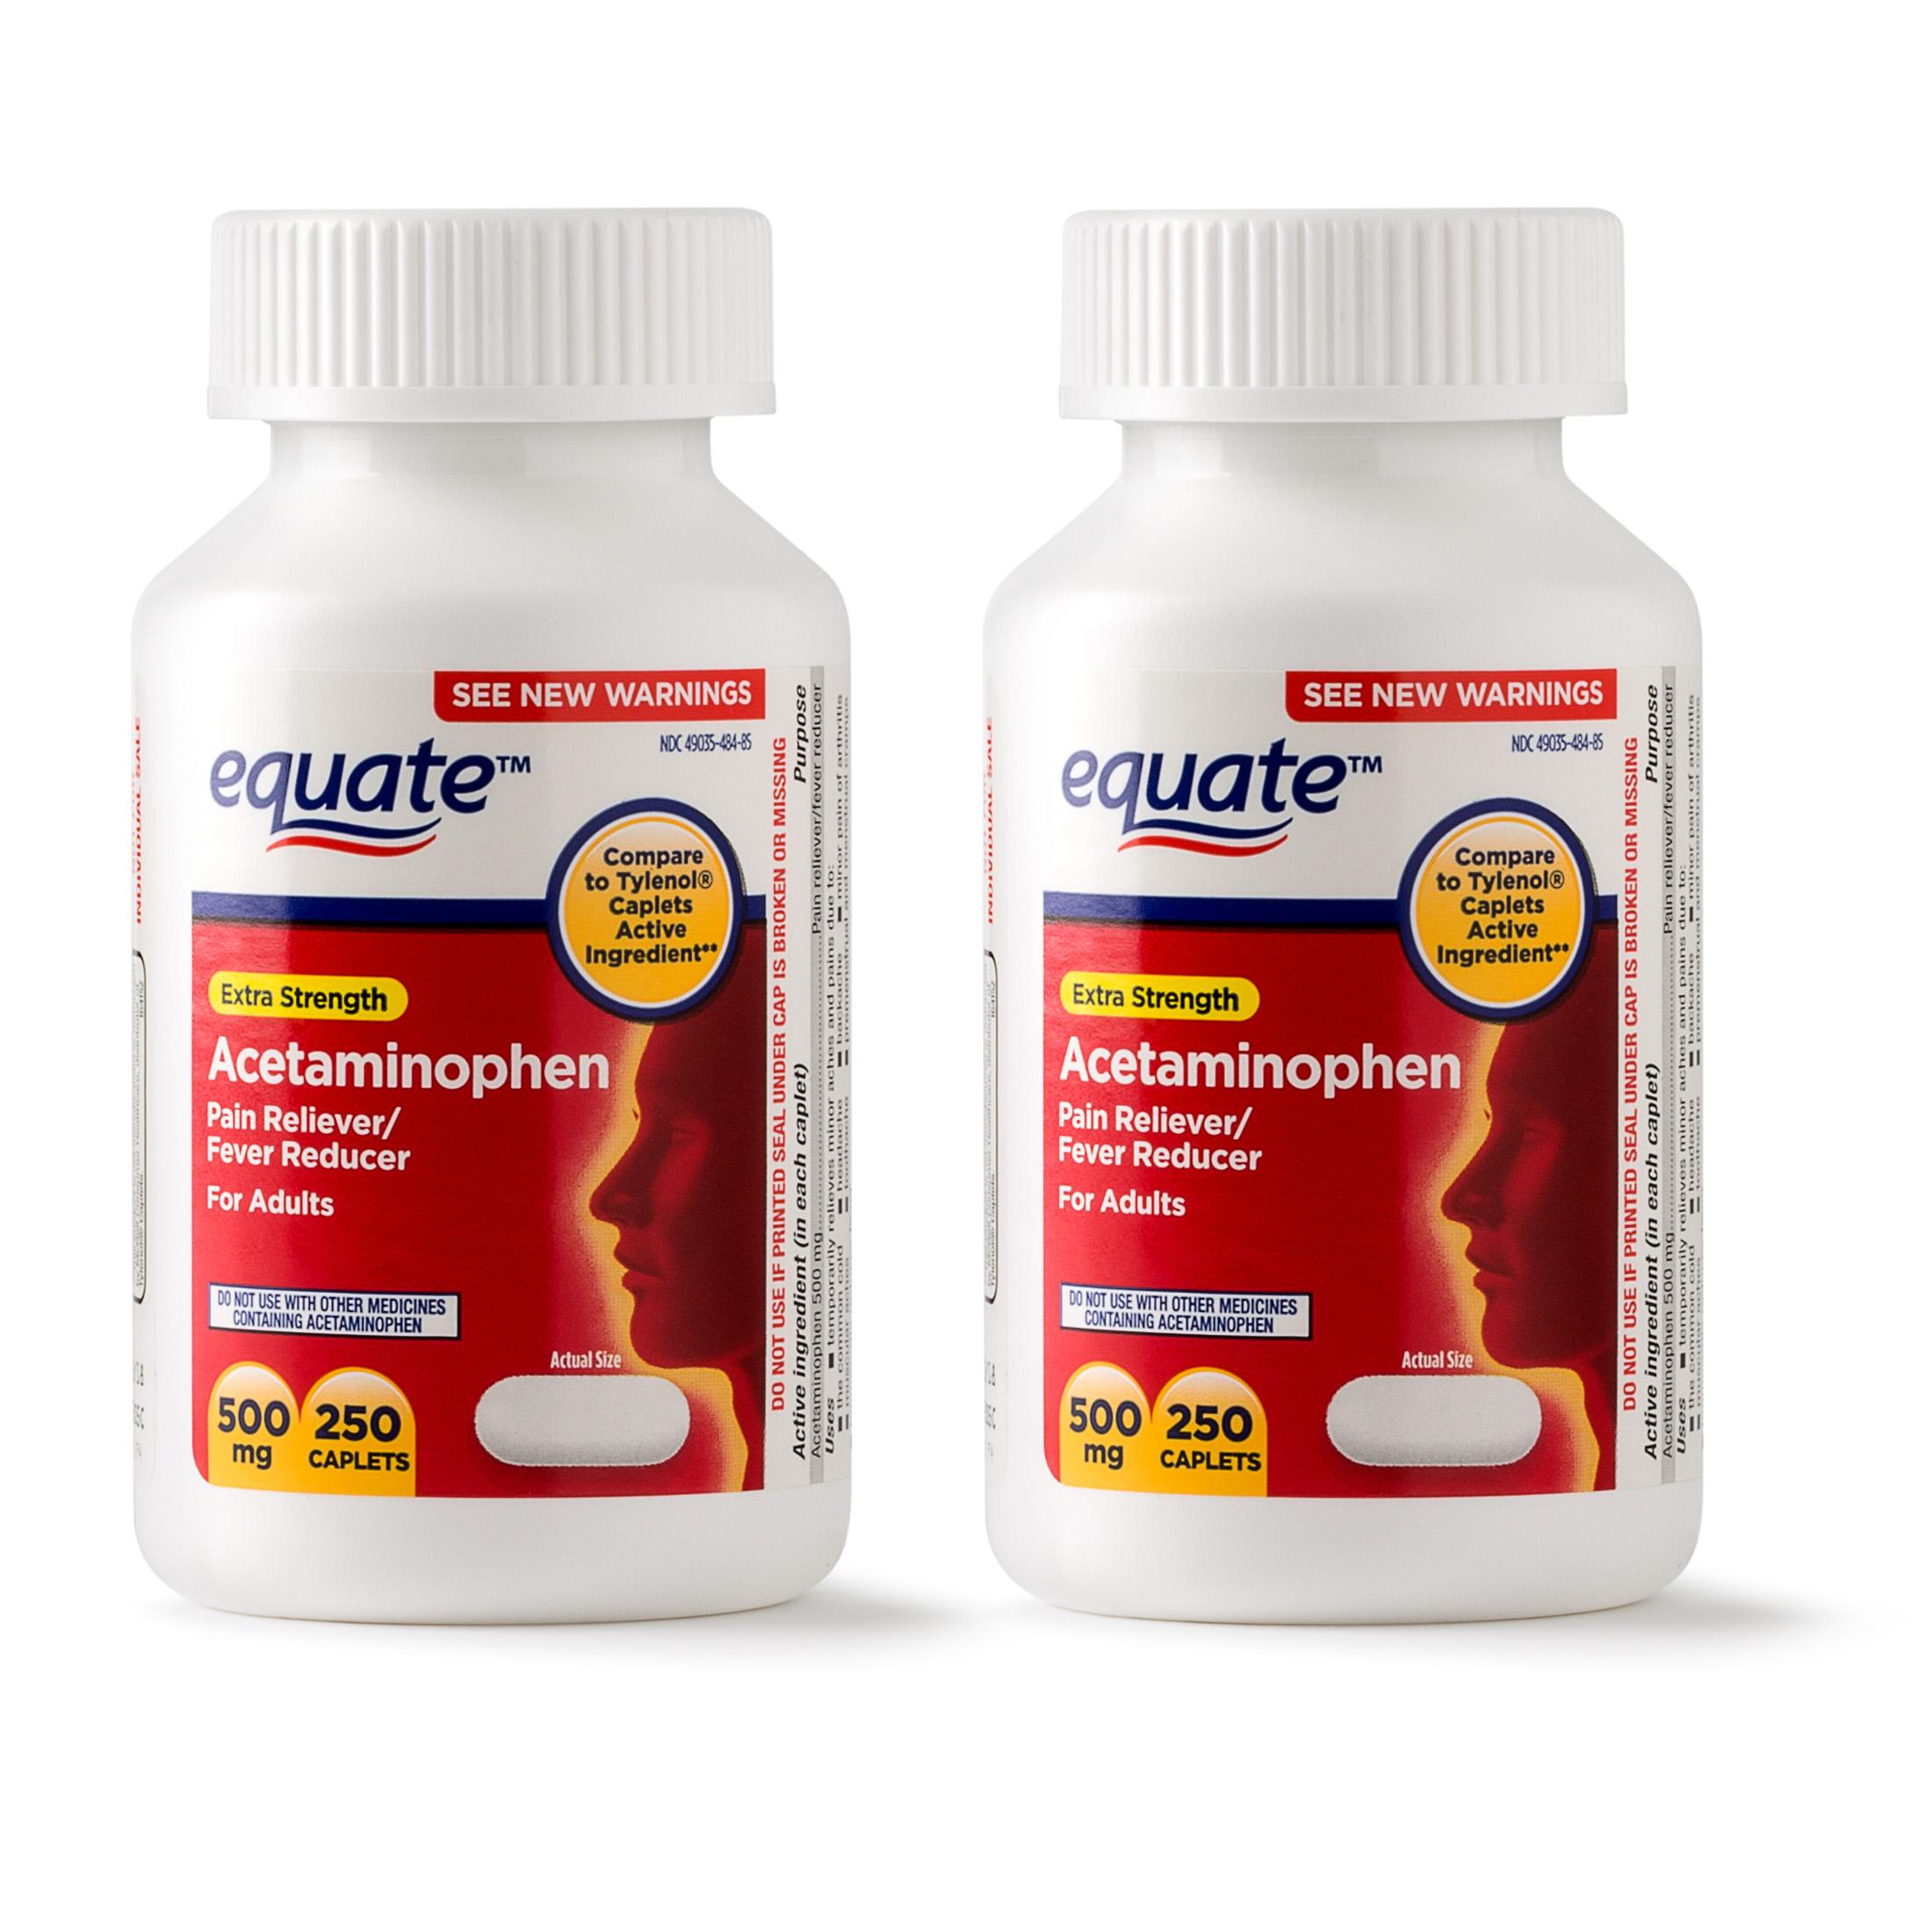 Equate Extra Strength Acetaminophen Caplets, 500 mg, 250 Ct, 2 Pk